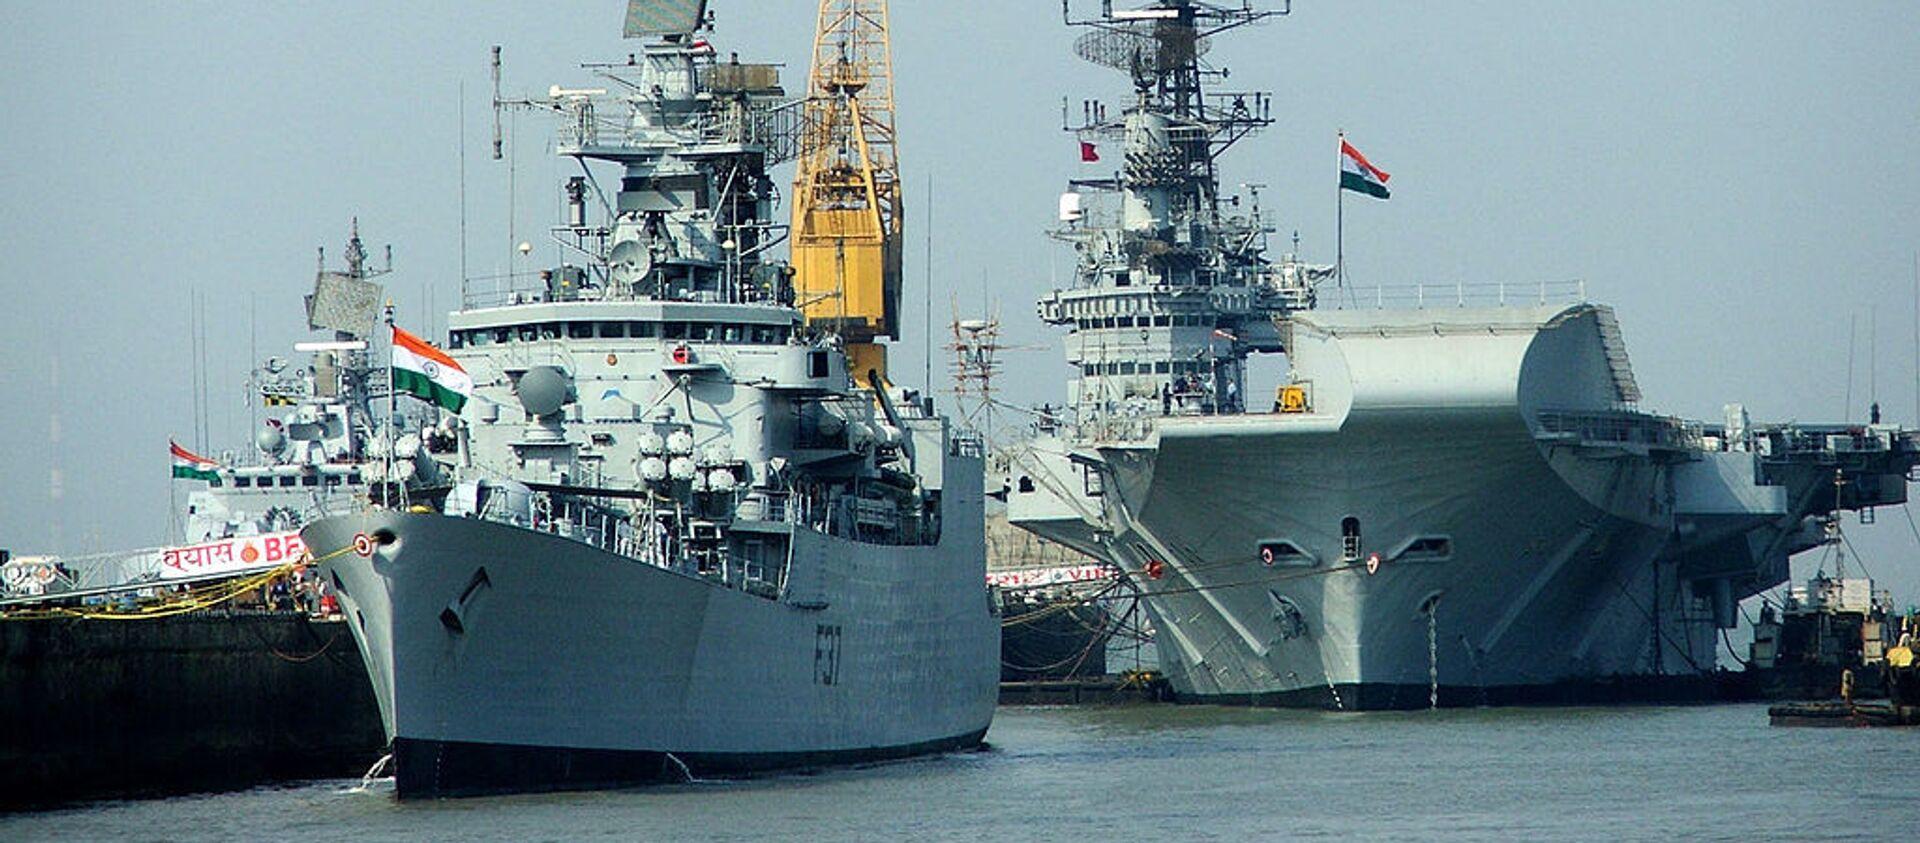 Indian Navy ships - Sputnik International, 1920, 04.02.2020